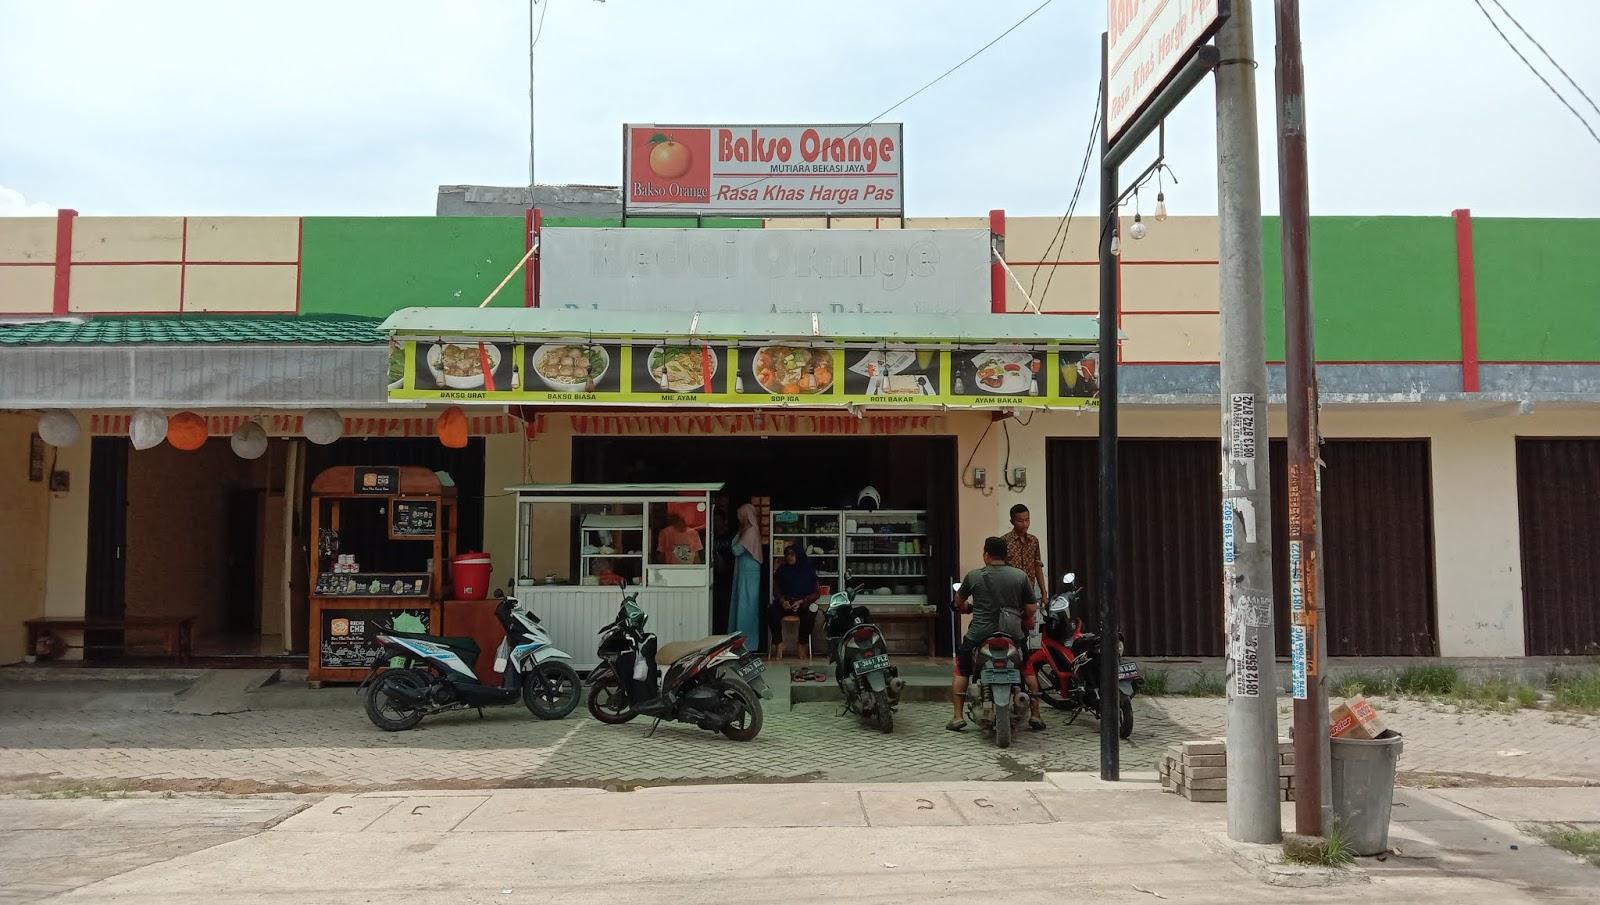 Bakso Orange Mutiara Bekasi Jaya